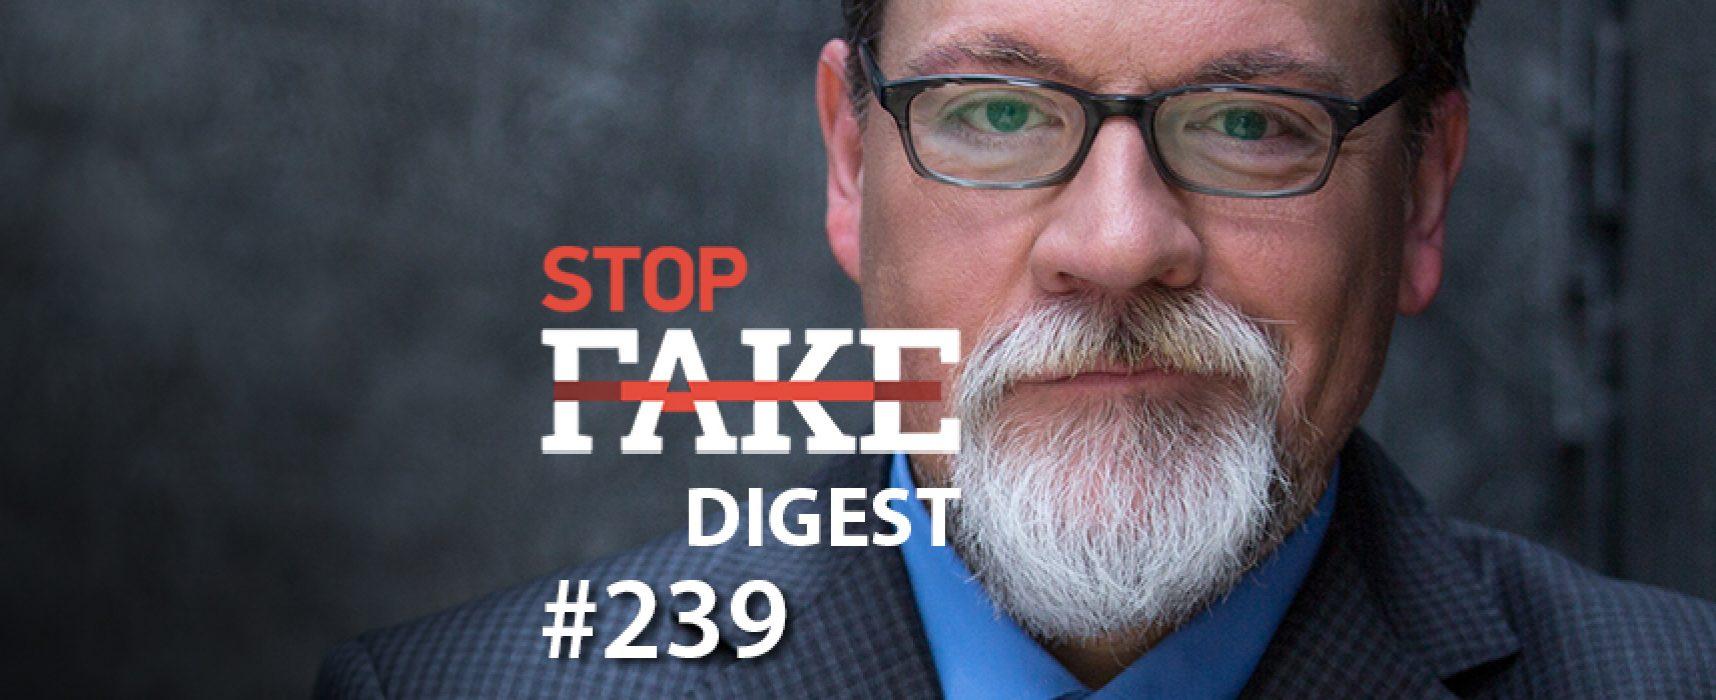 StopFakeNews #239 with Marko Suprun